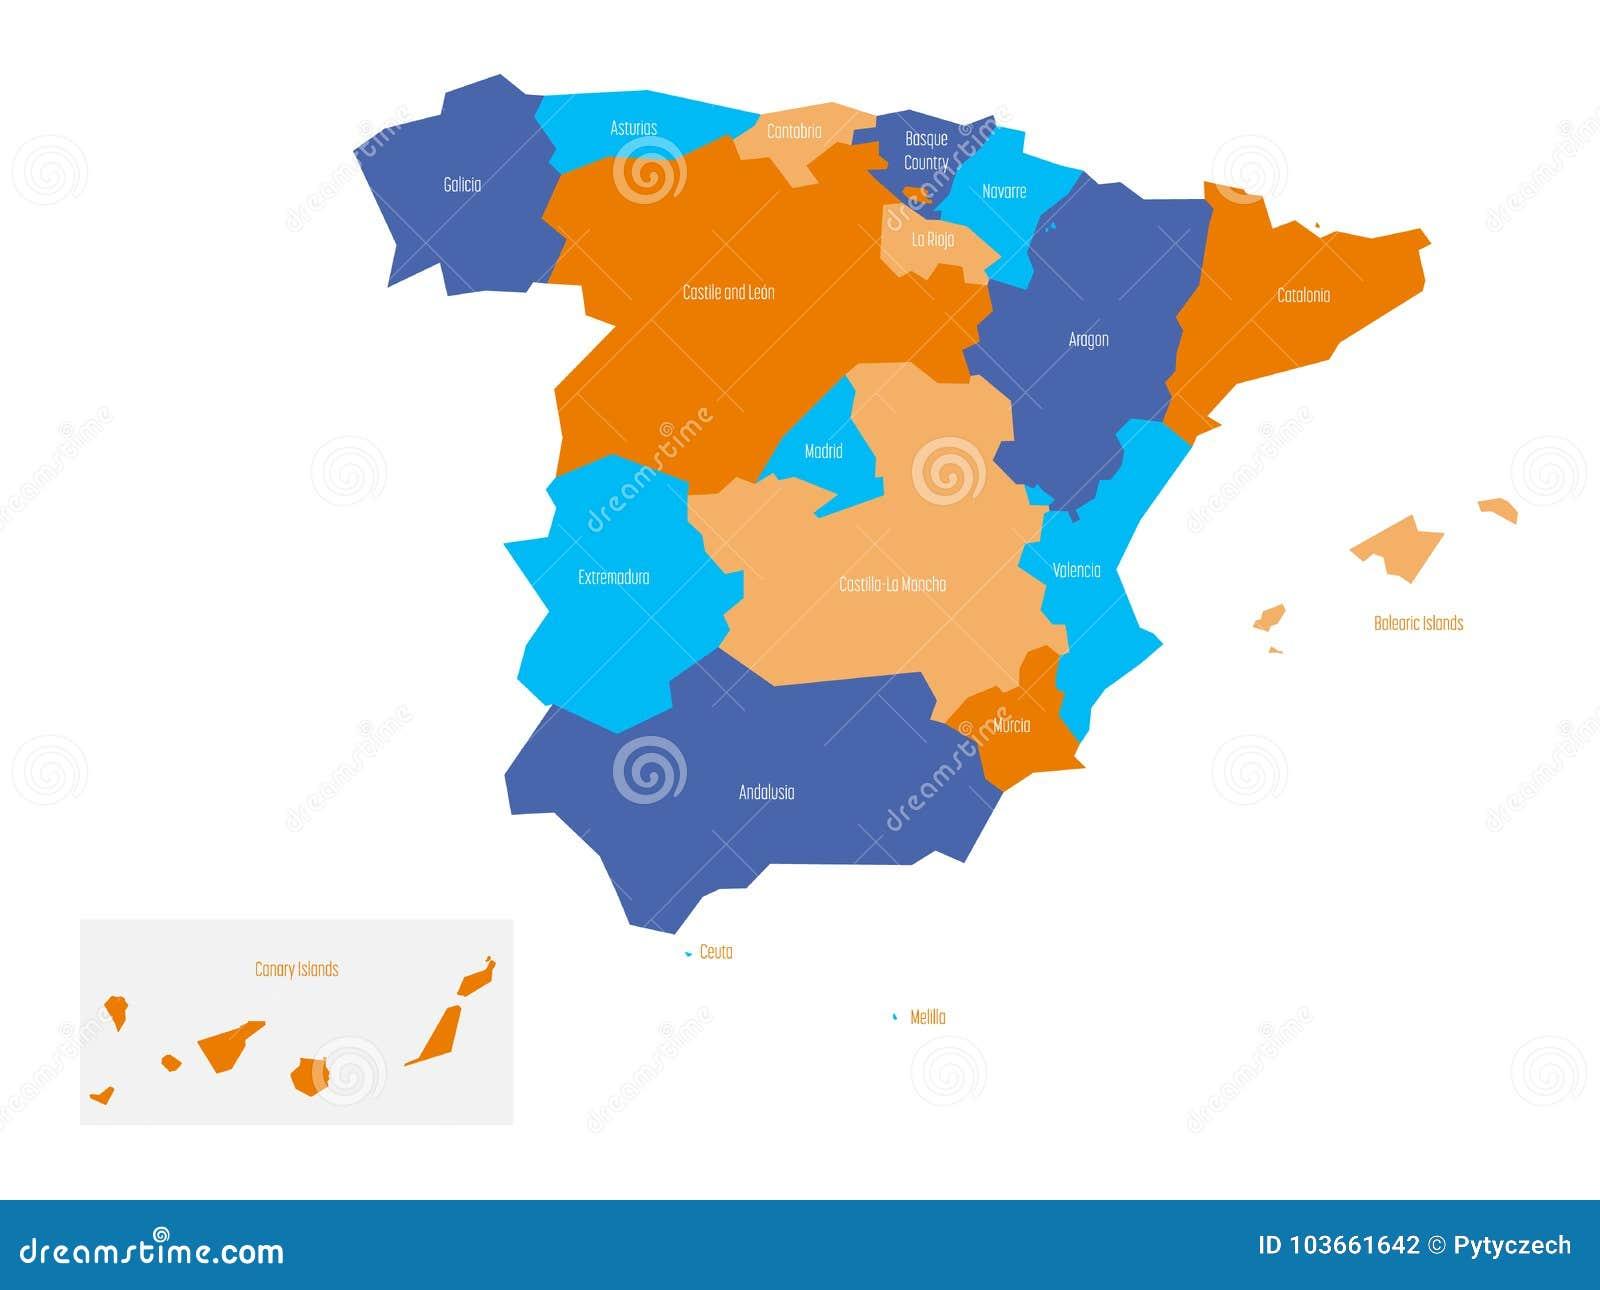 Melilla Spain Map.Map Of Spain Devided To Administrative Autonomous Communities